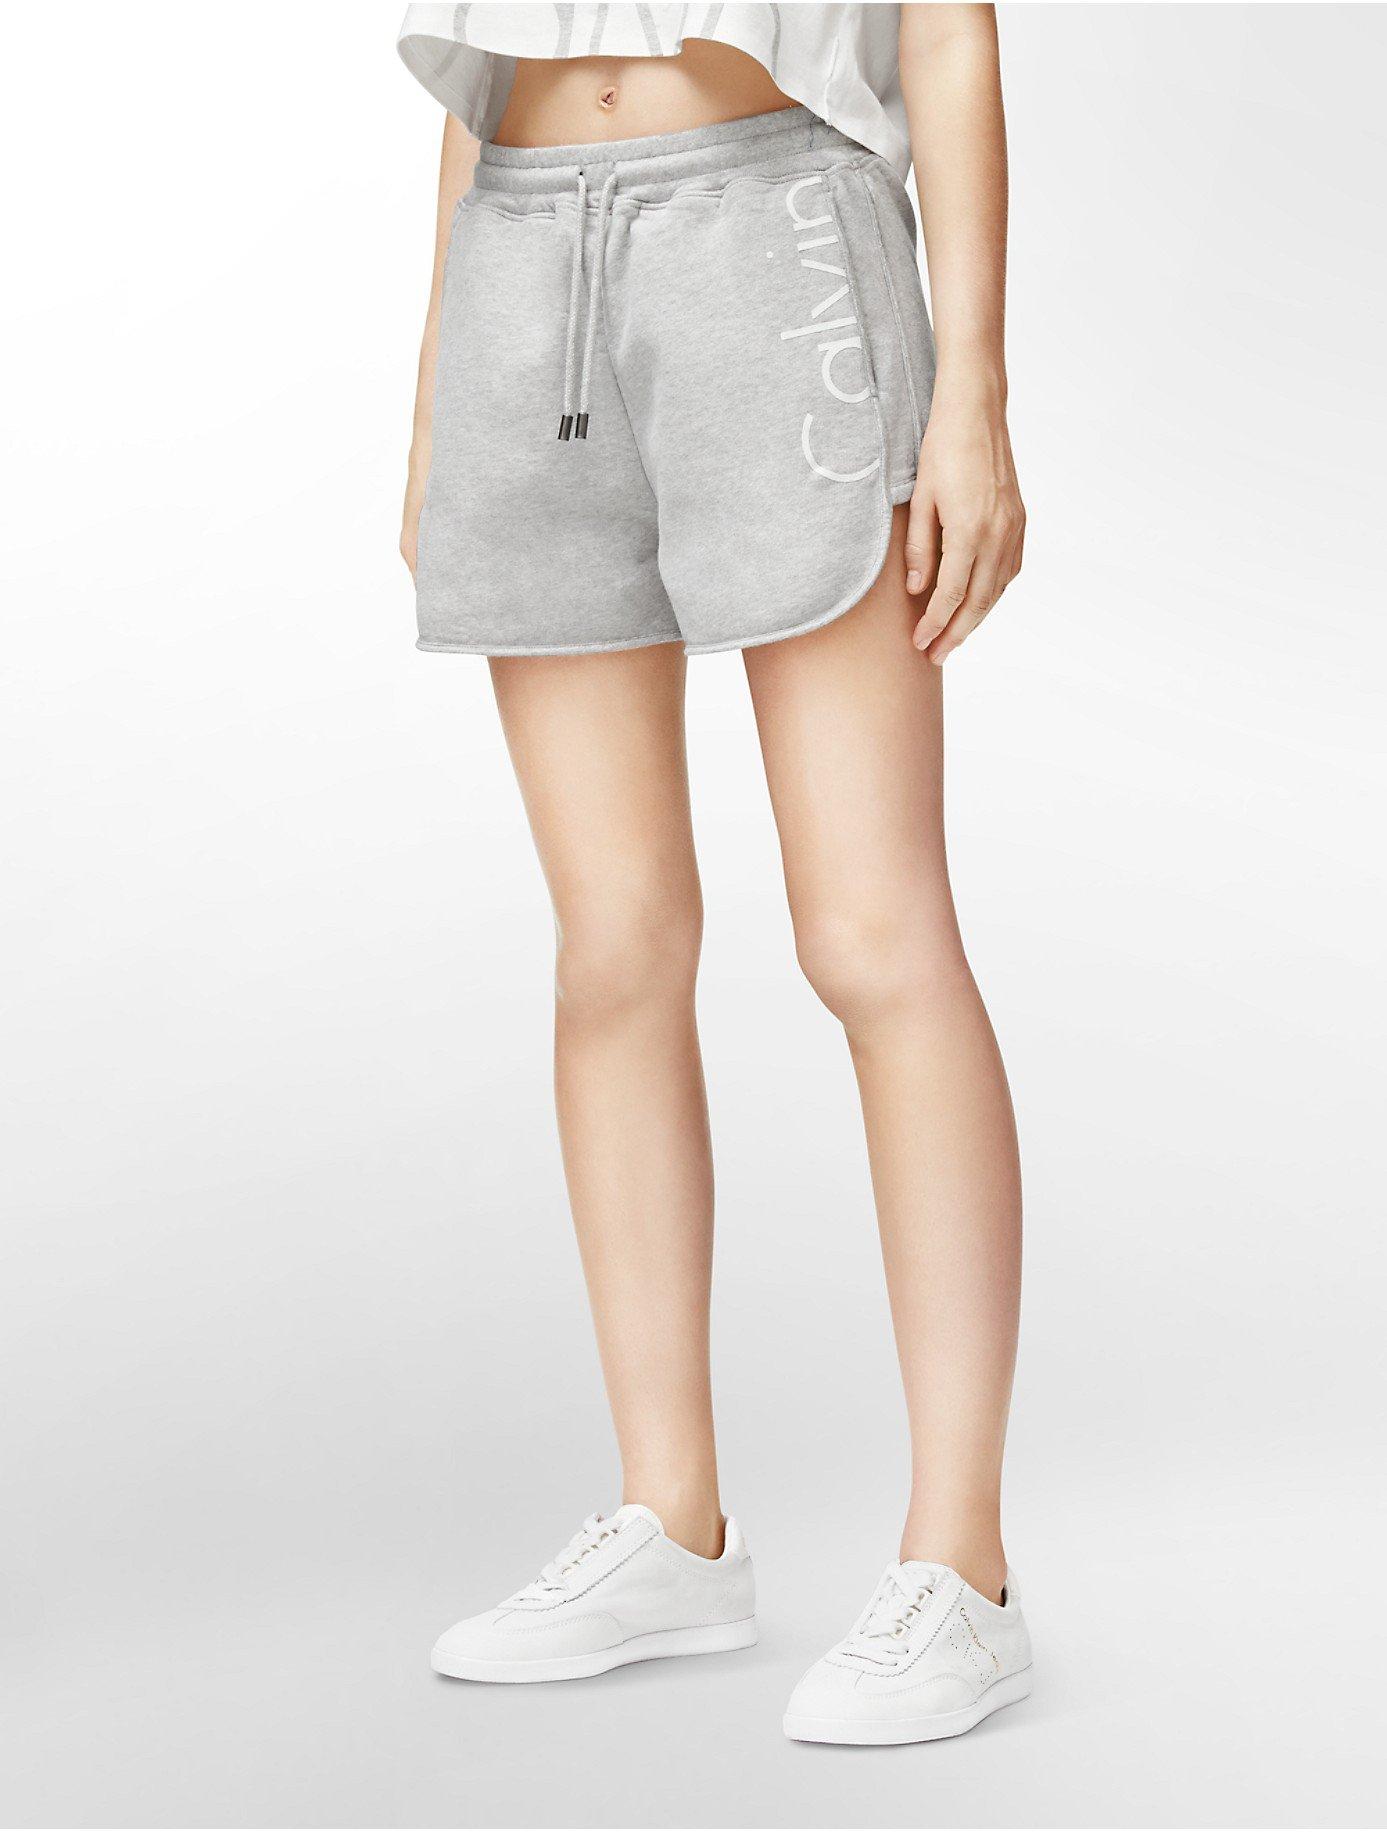 407424e27635e calvin-klein-concrete-heather-jeans-logo-jogger-sweatshorts -product-2-635368125-normal.jpeg